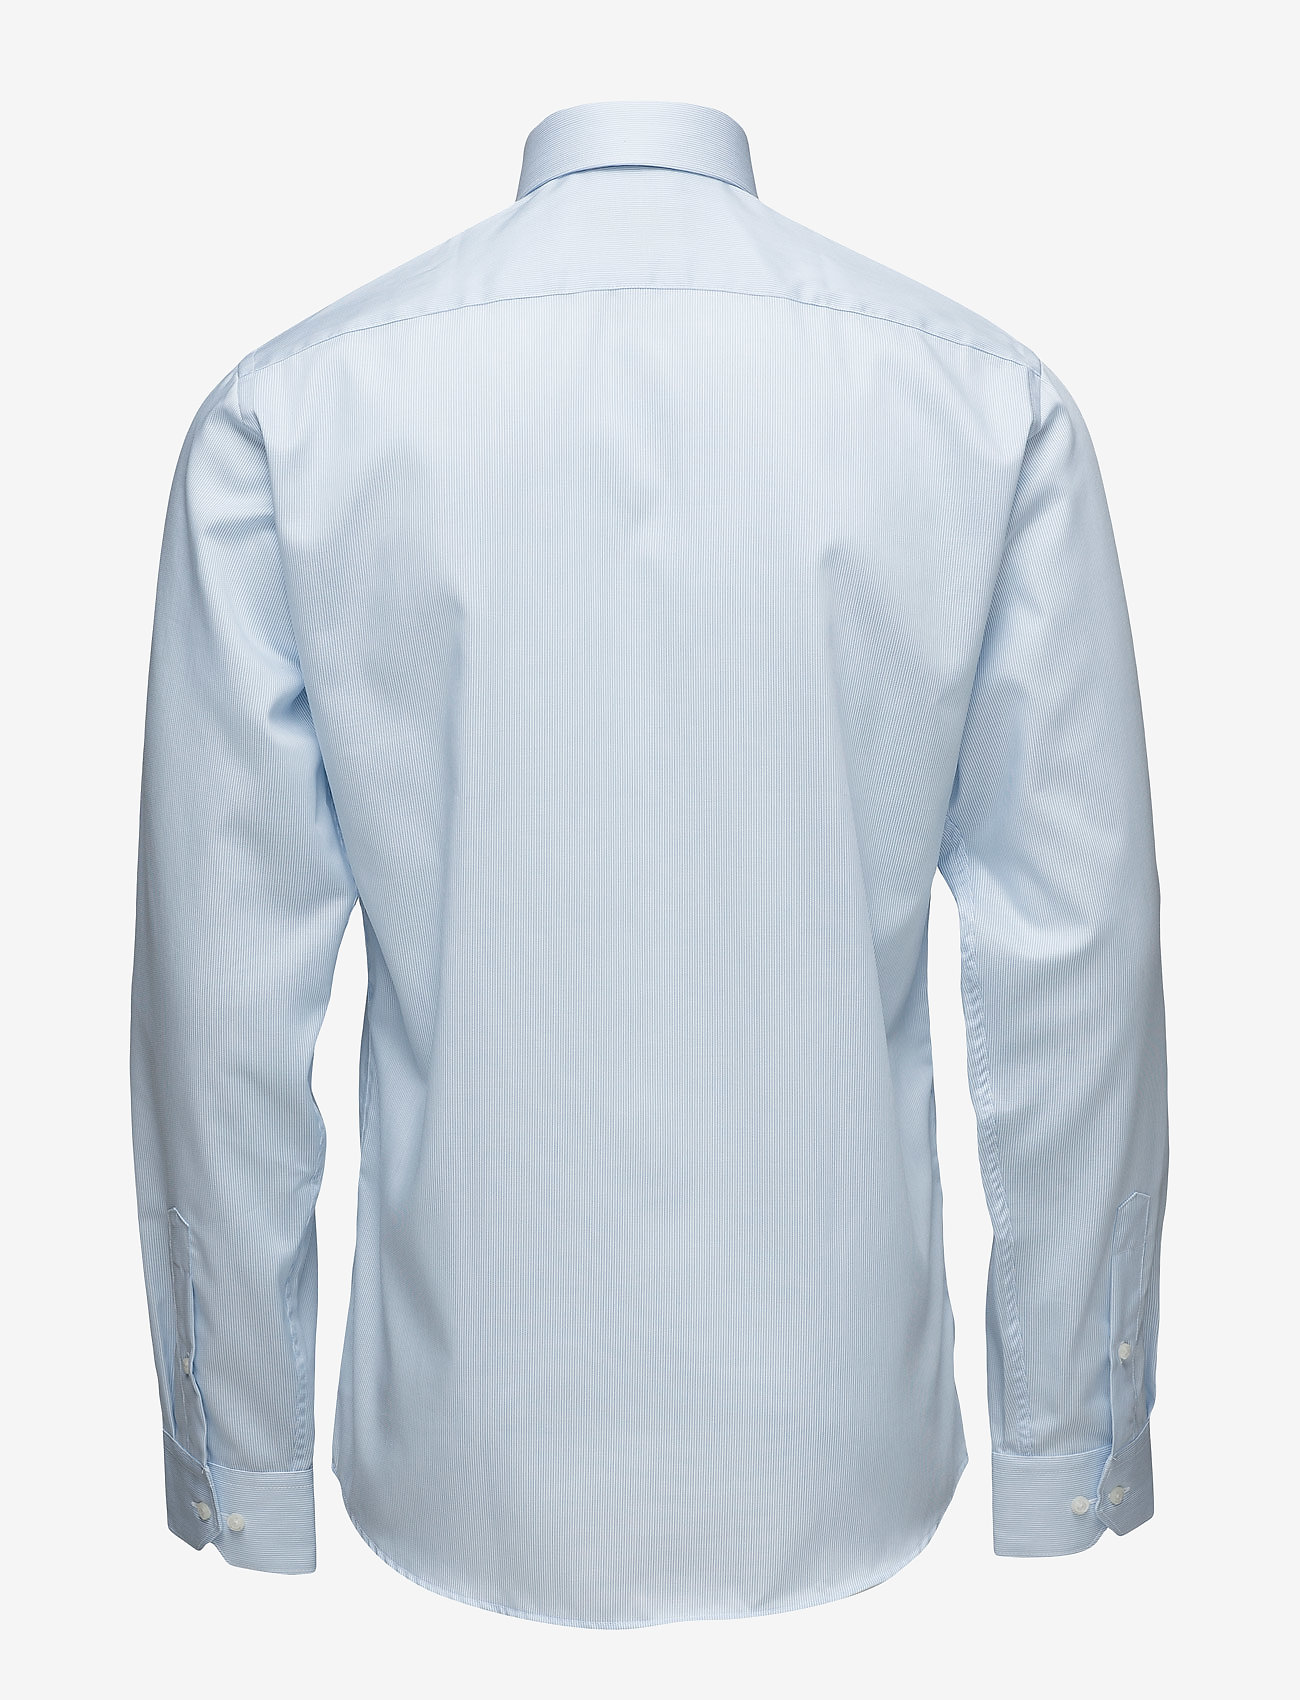 Seven Seas Copenhagen - Fine Twill | California - Slim Fit - basic shirts - light blue - 1